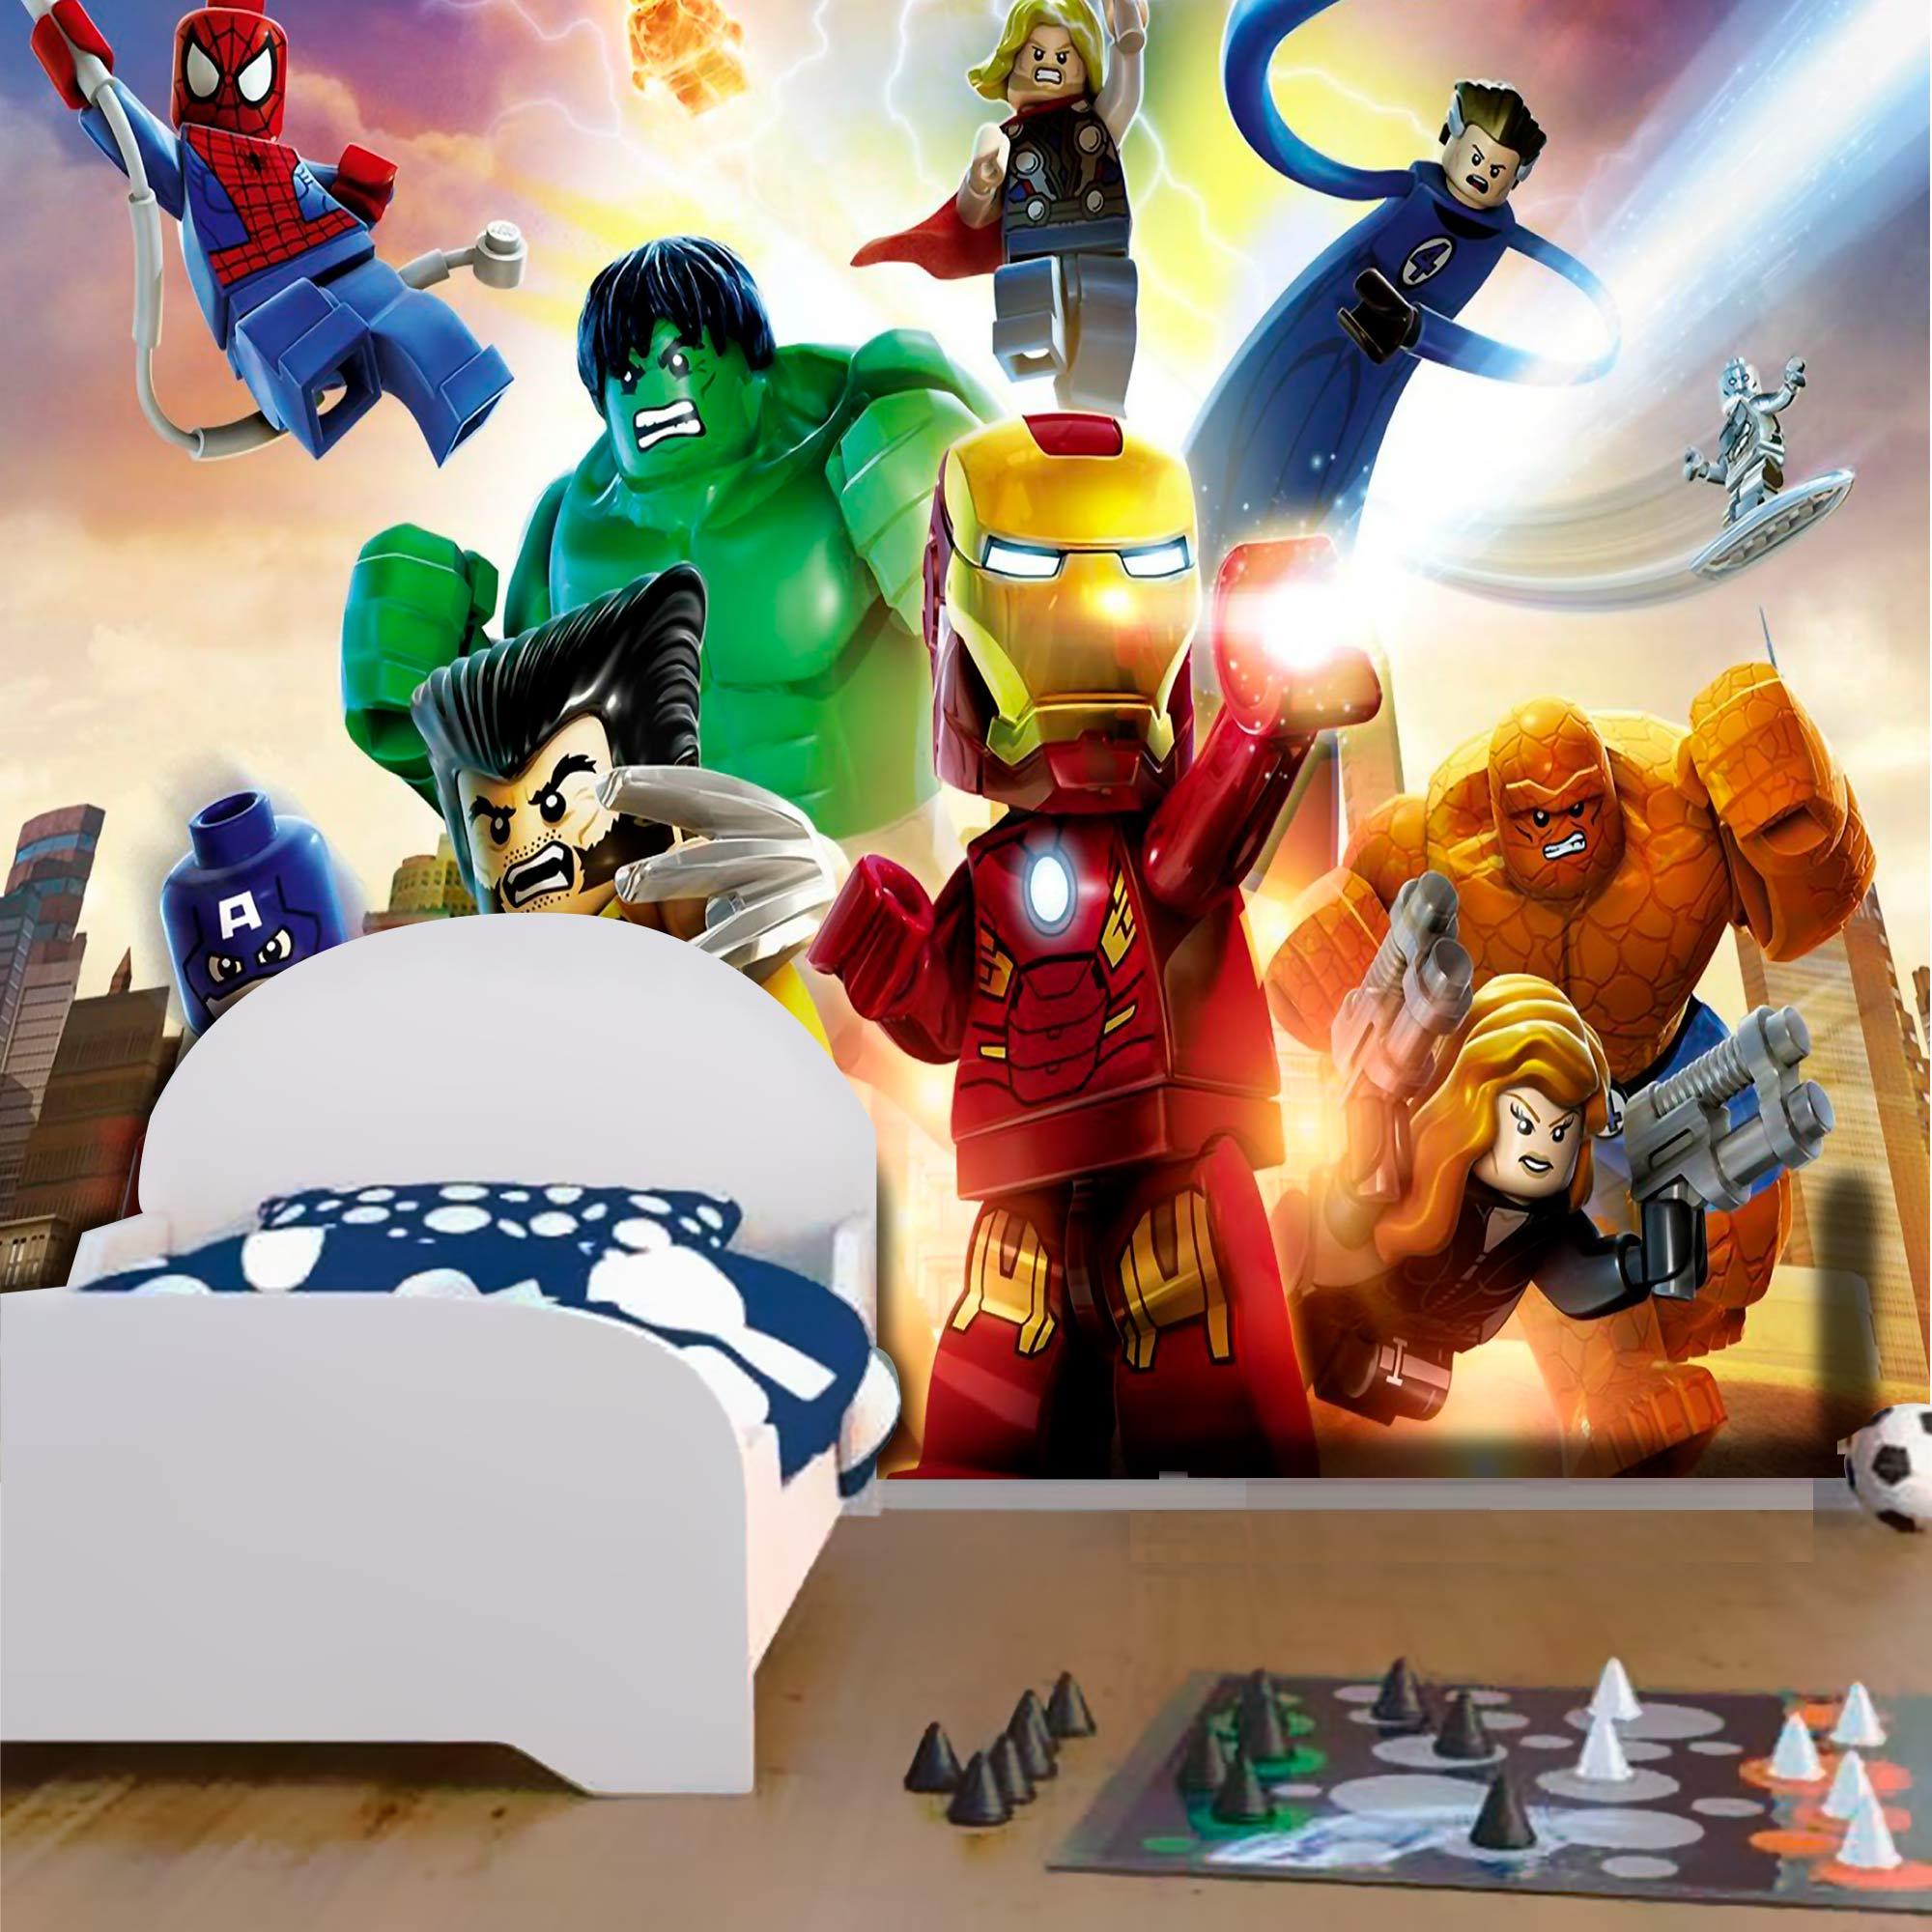 Papel De Parede Adesivo Vingadores Lego Quarteto Fantástico  - Final Decor